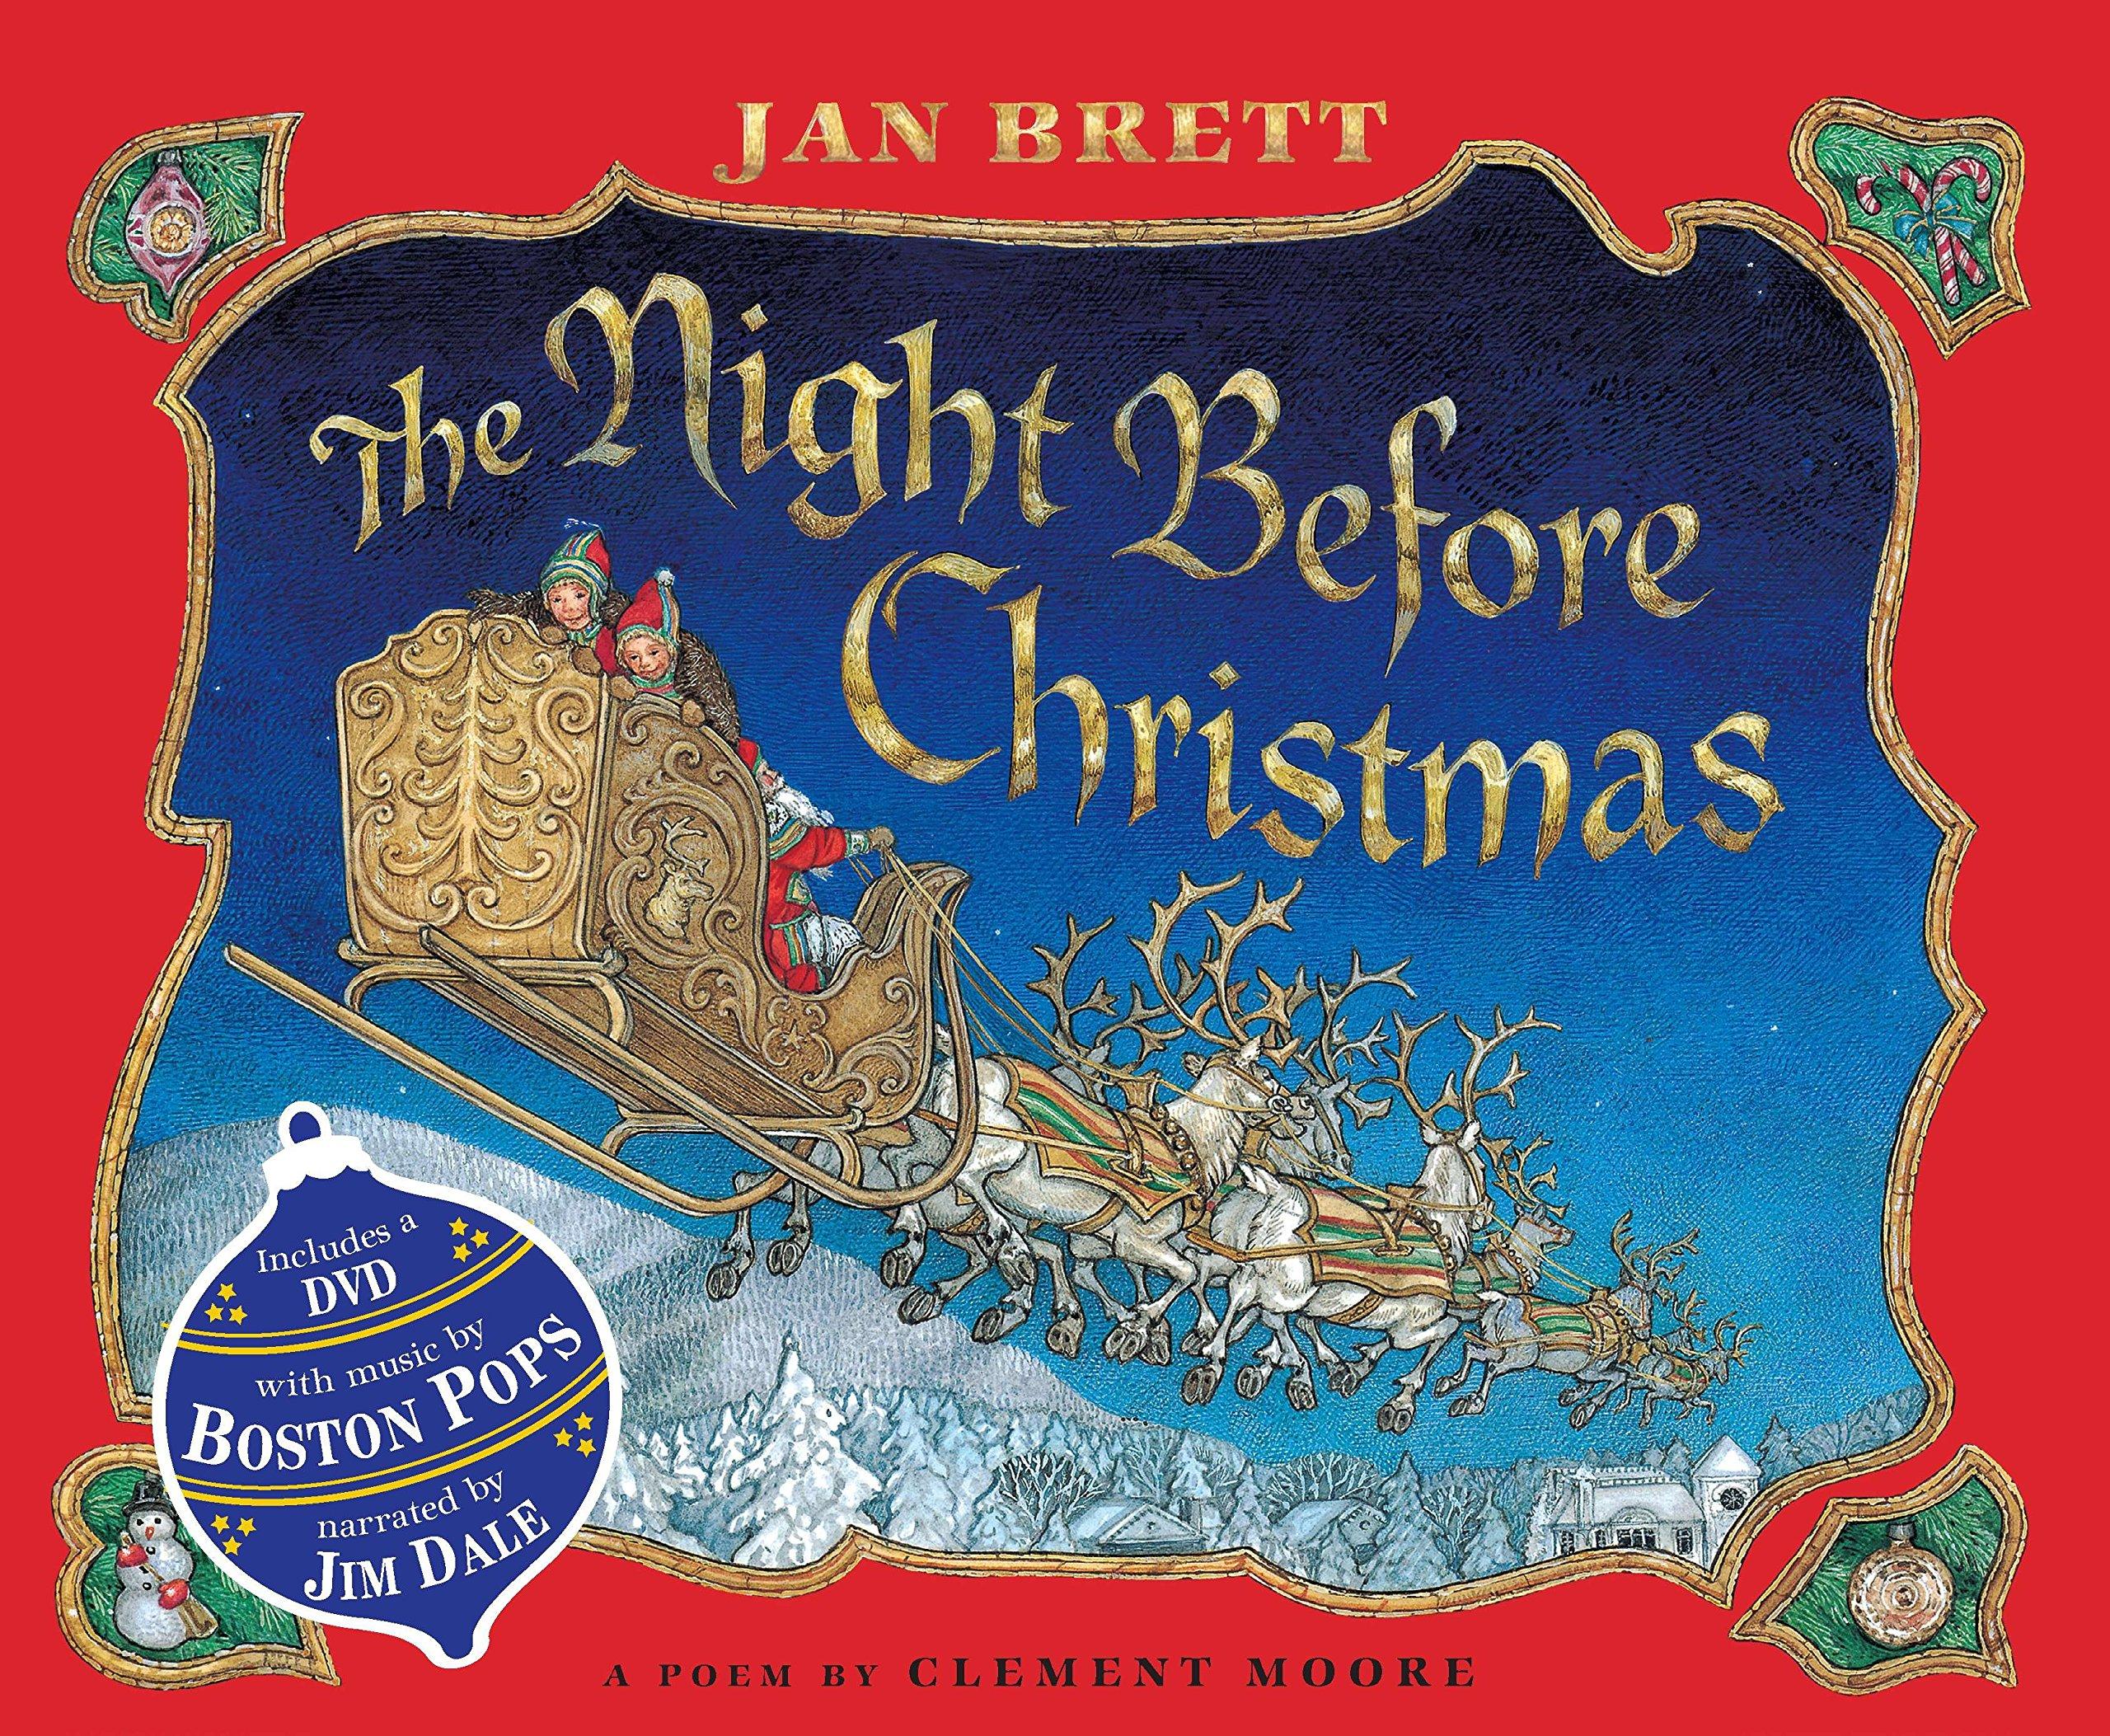 Amazon.com: The Night Before Christmas (Book & DVD) (9780399256707 ...